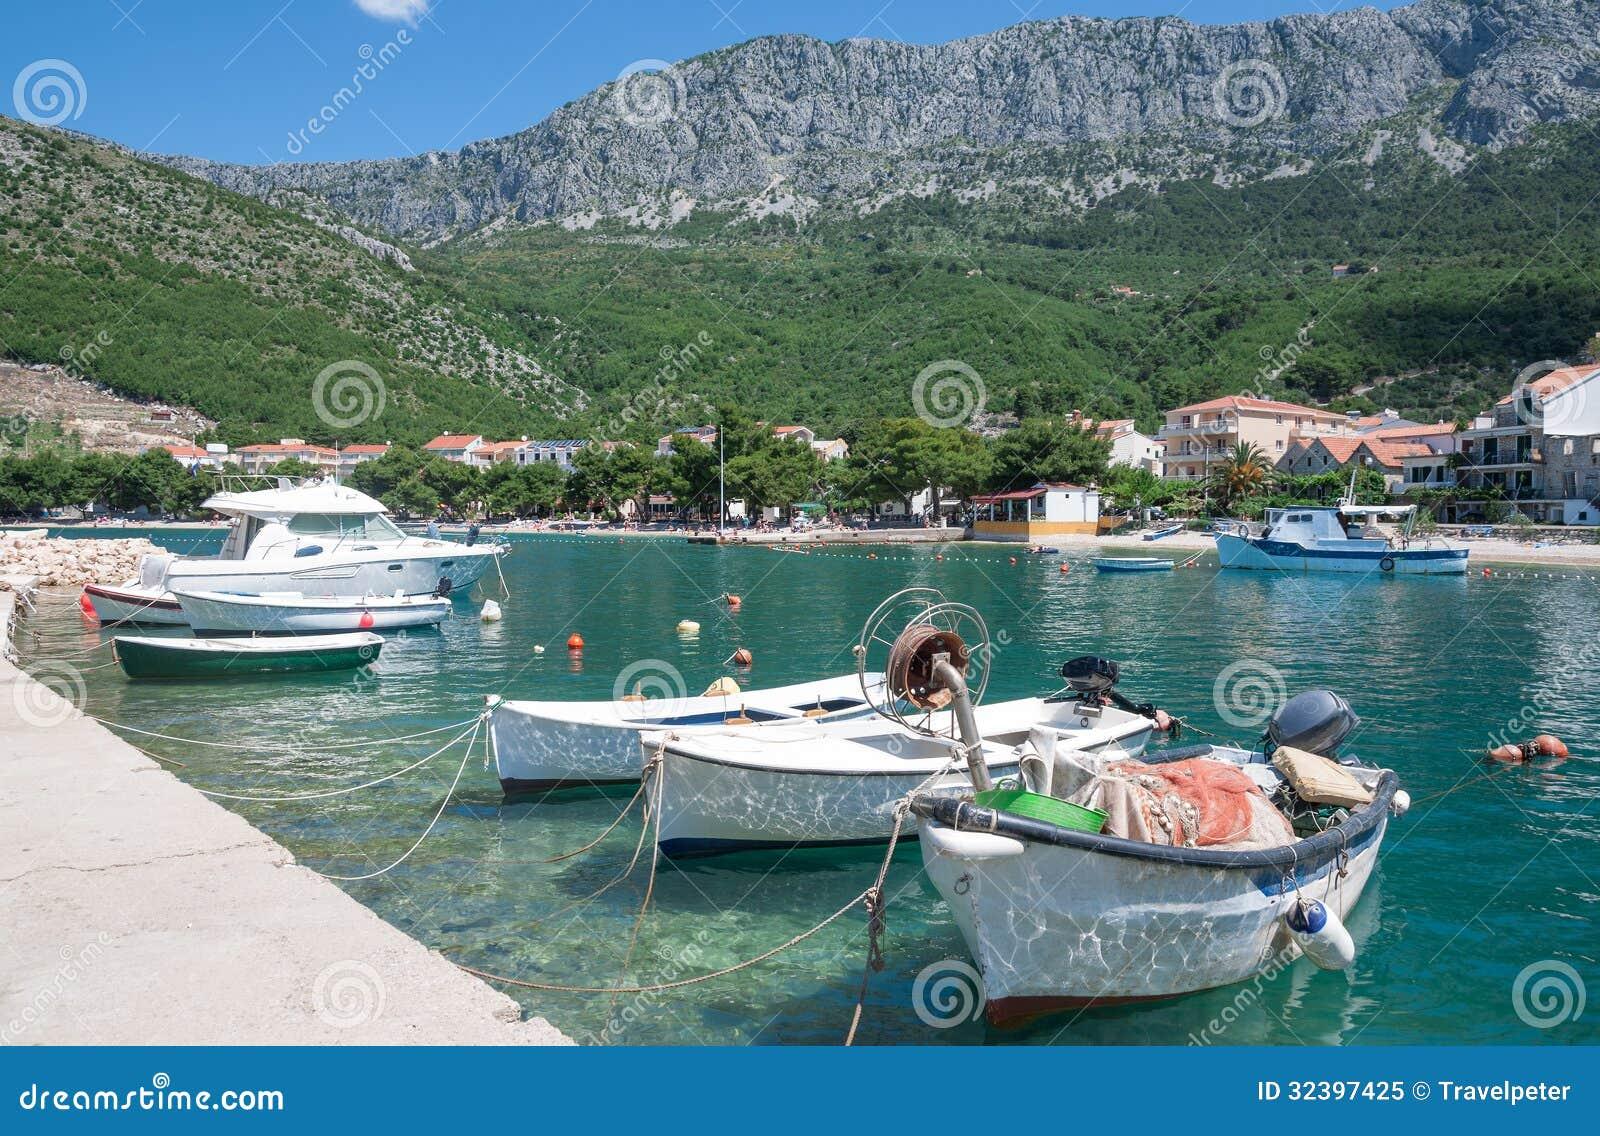 Drvenik Makarska Riviera, Dalmatia, Kroatien